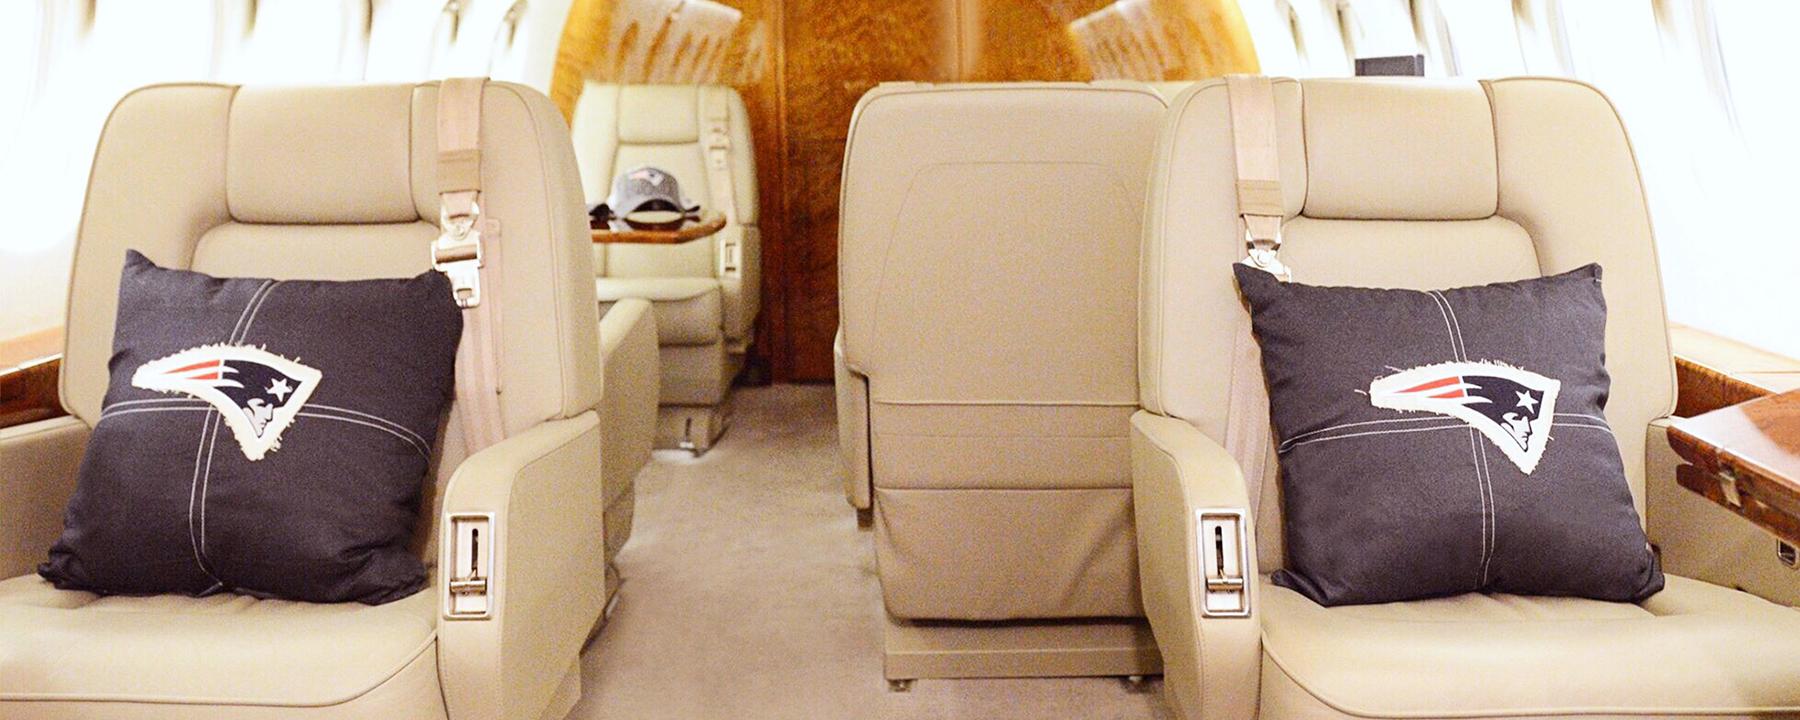 private jet interior for superbowl